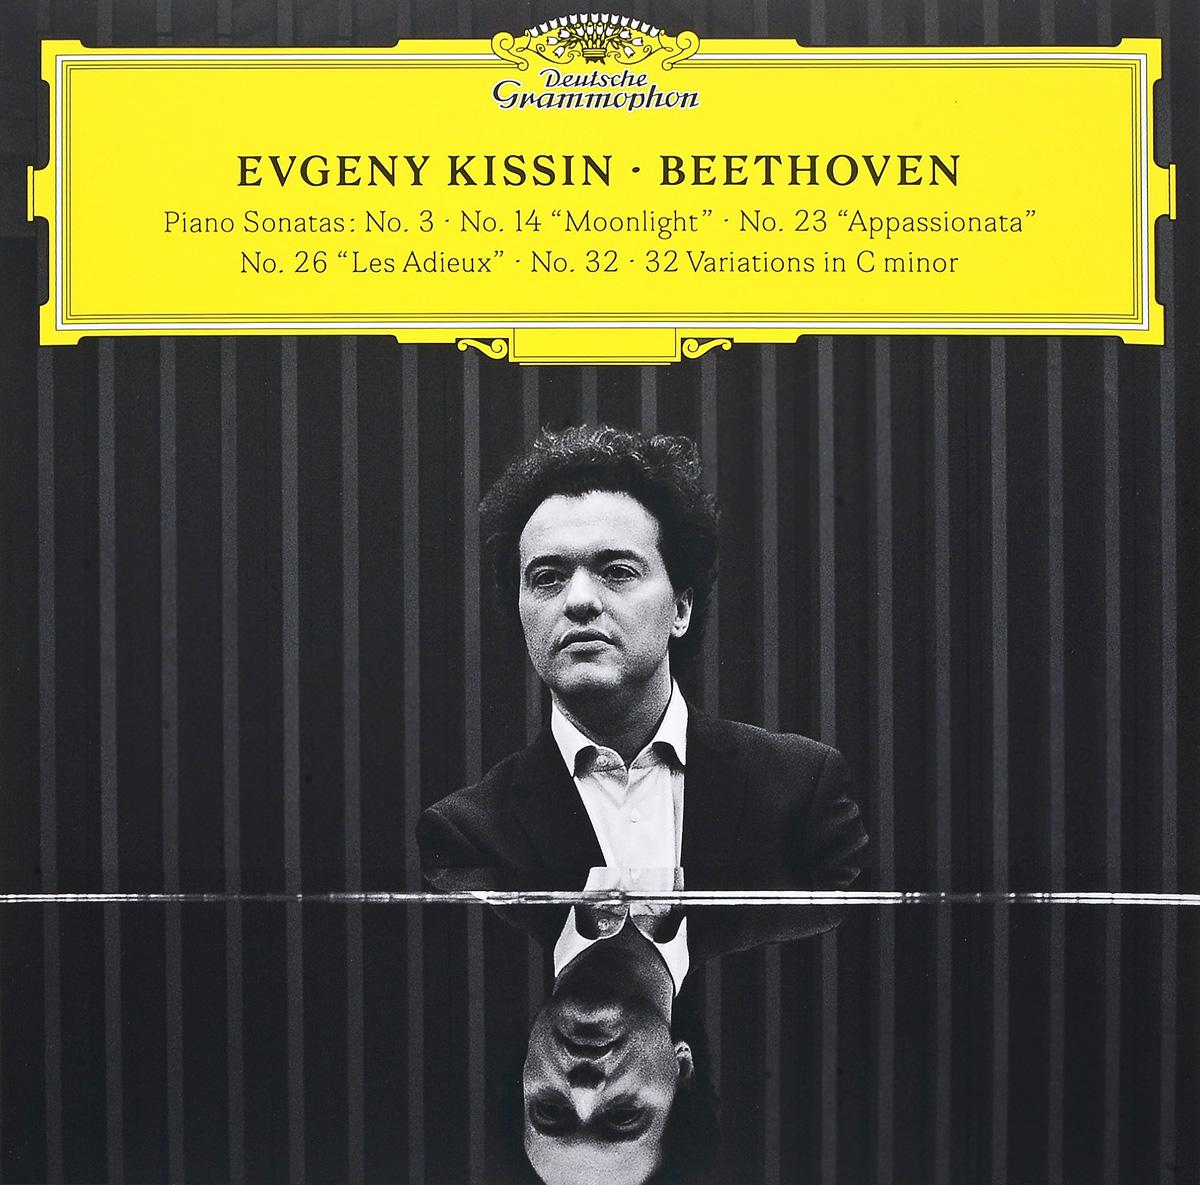 Yevgeny Kissin. Evgeny Kissin / Beethoven (3 LP) beethoven beethovenevgeny kissin recital 3 lp